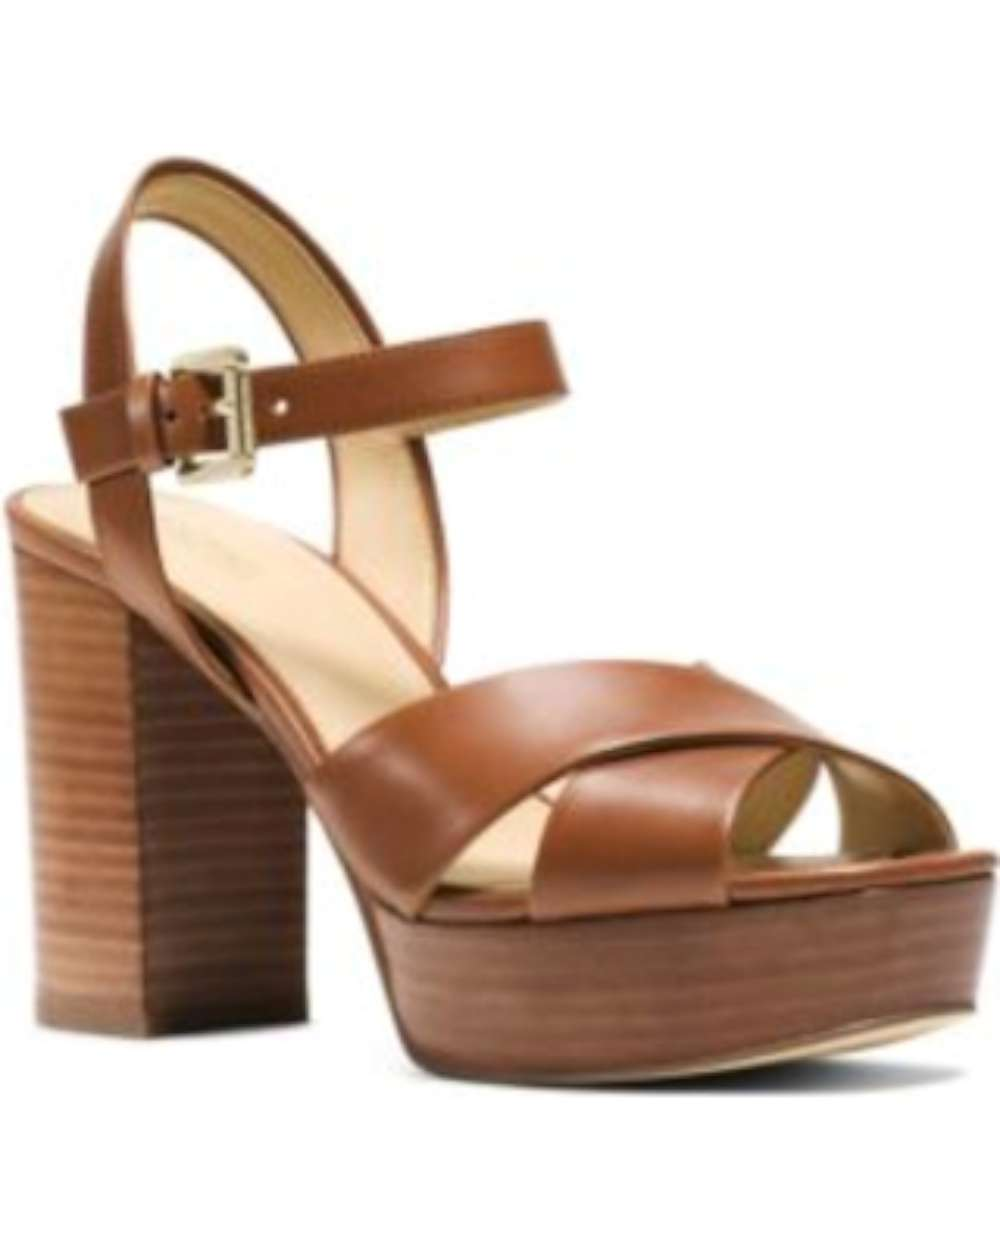 d1424dff49dc MICHAEL Michael Kors Womens Divia Open Toe Casual Ankle Strap ...